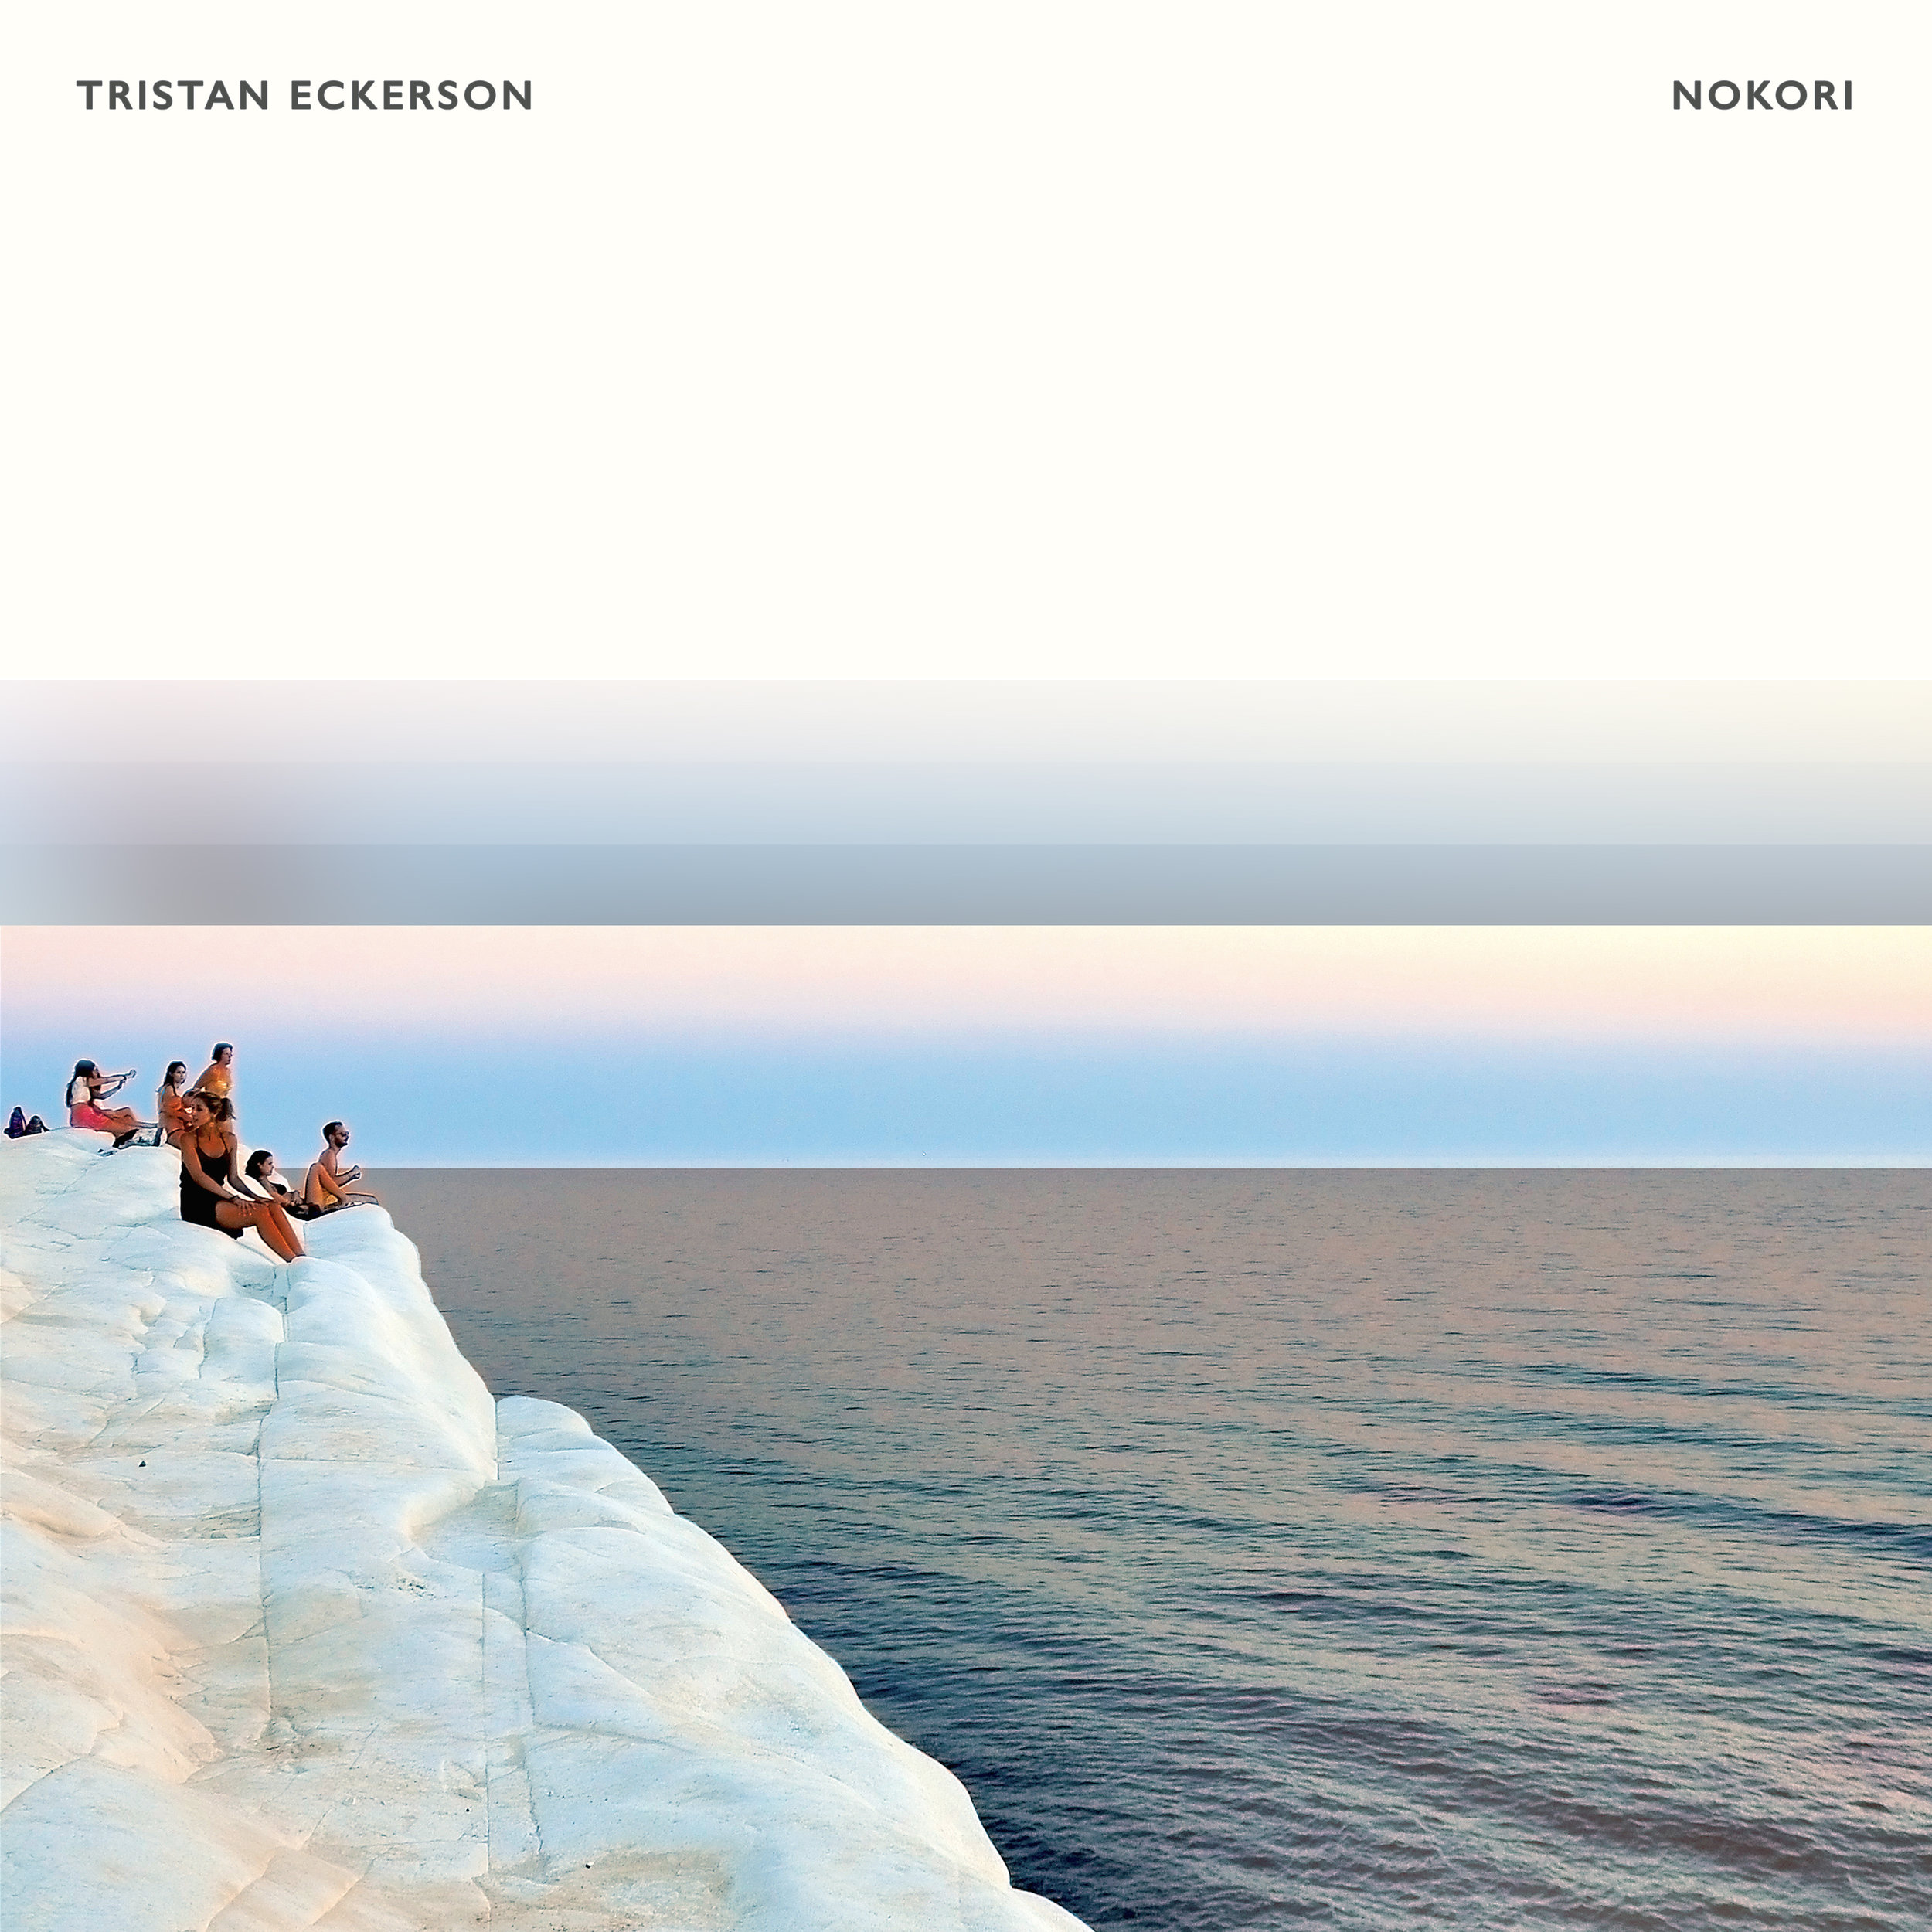 Tristan Eckerson - Nokori